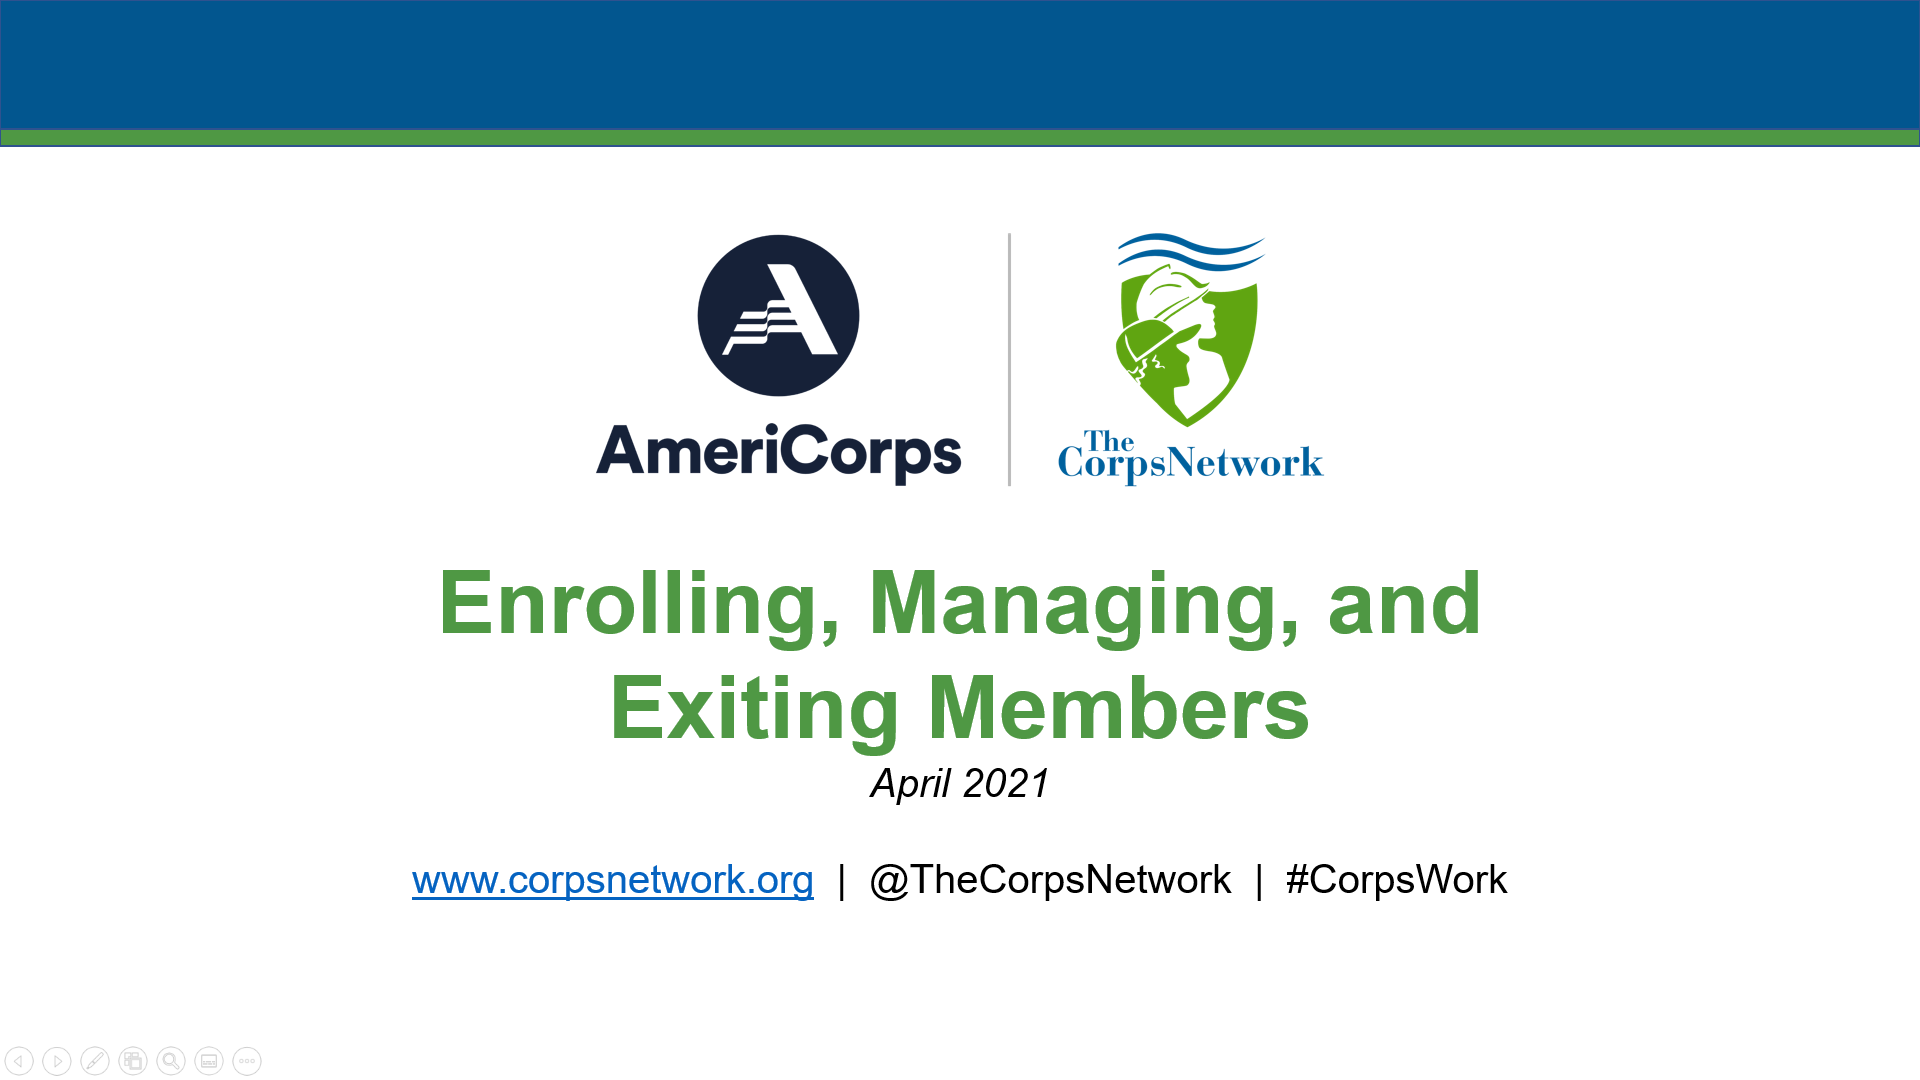 Enrolling, Managing, and Exiting Members